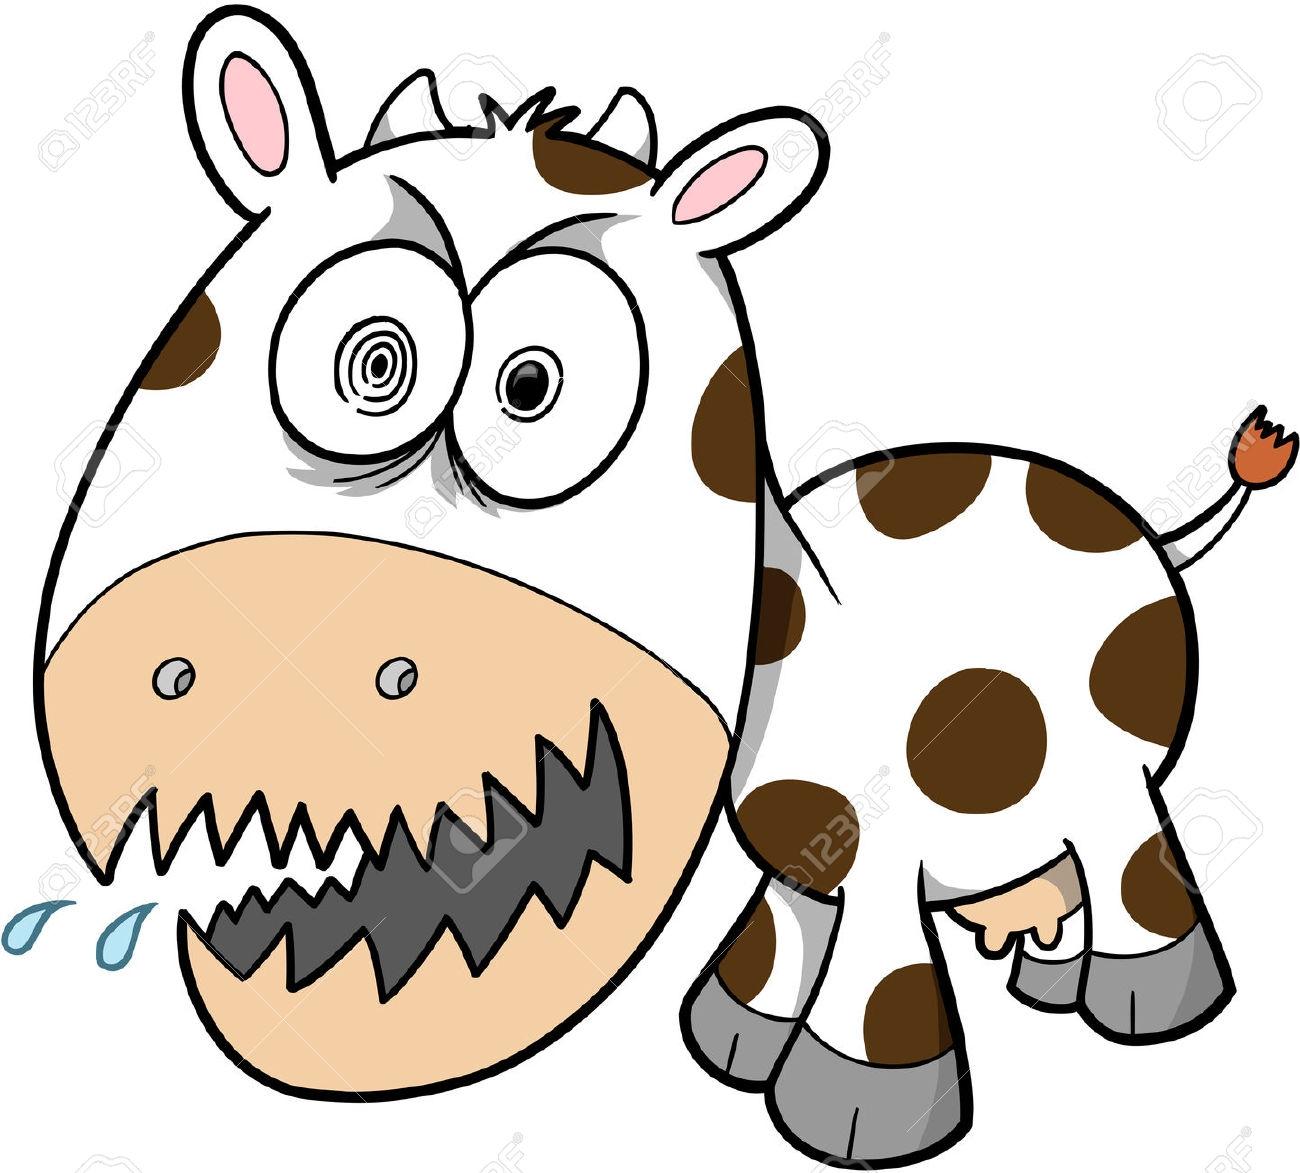 1300x1173 Clipart Cow On Animais Clip Art And Cute Cows